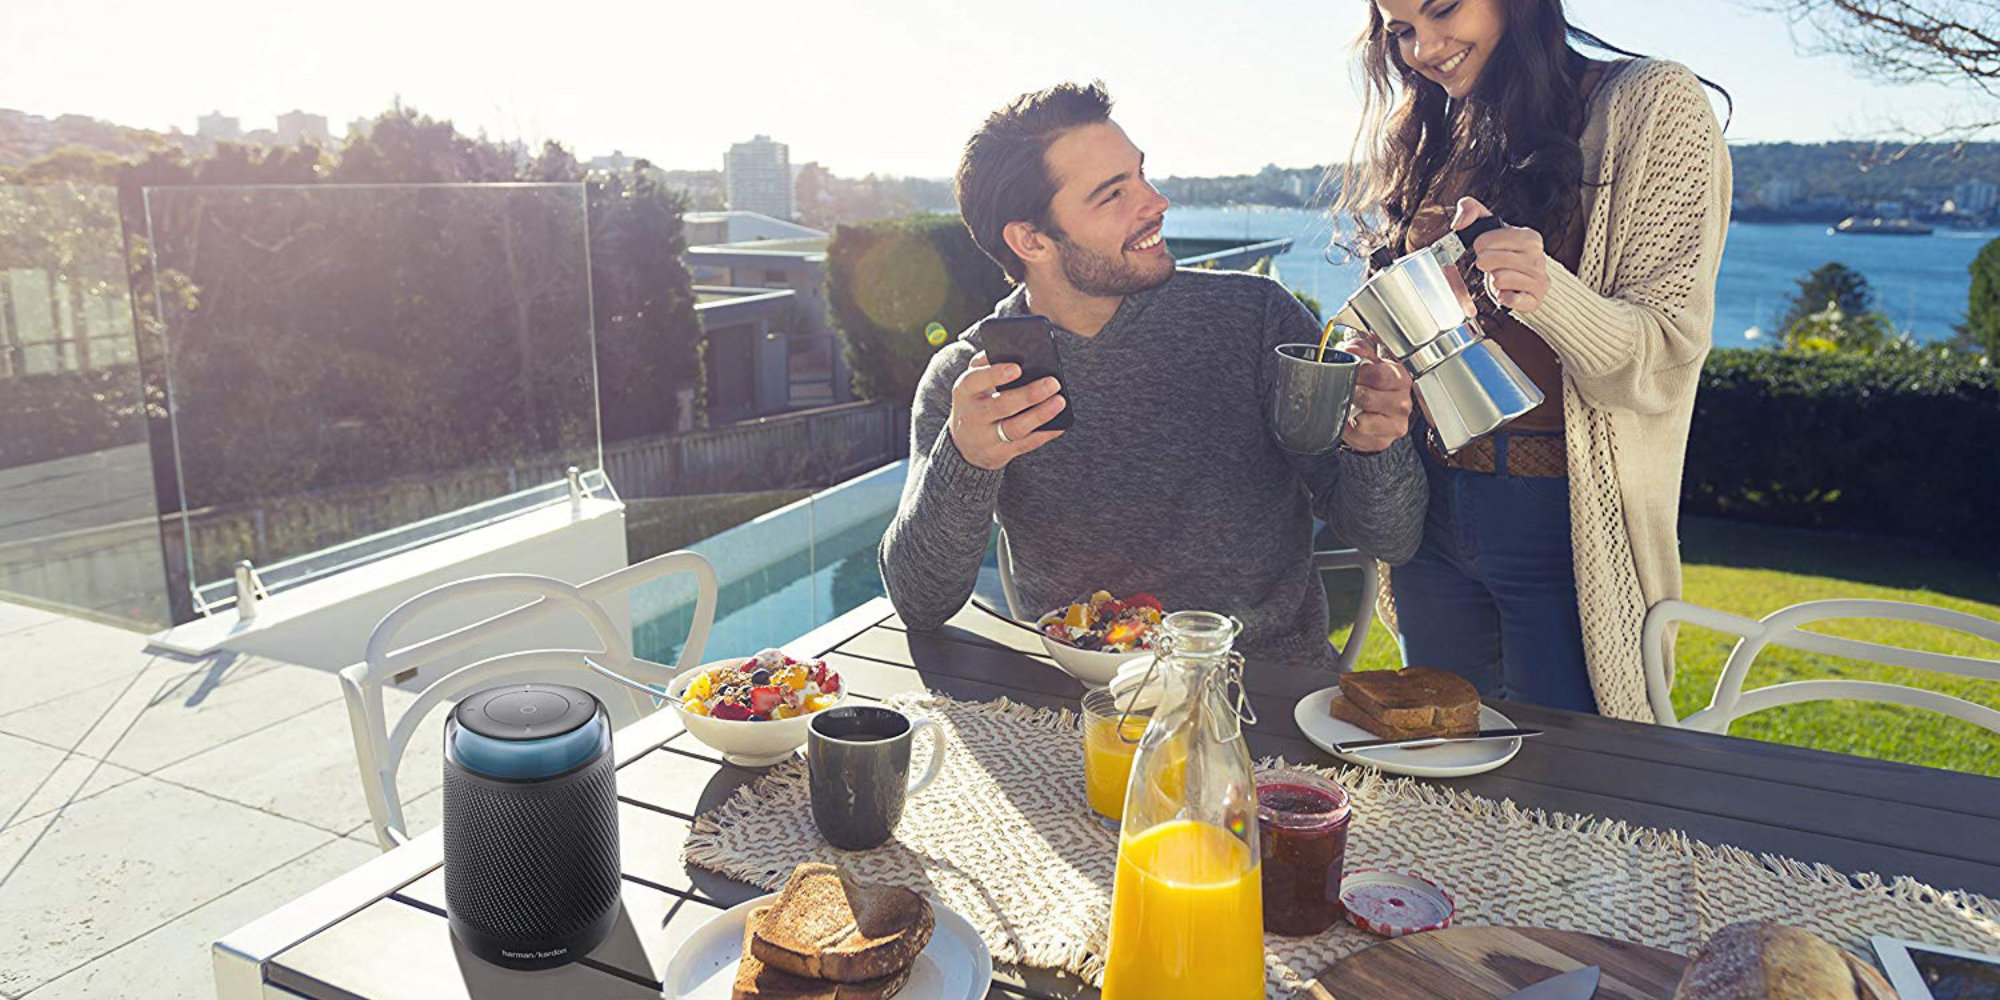 Harman Kardon Allure offers portable, 360-degree audio w/ Alexa built-in: $65 (All-time low)